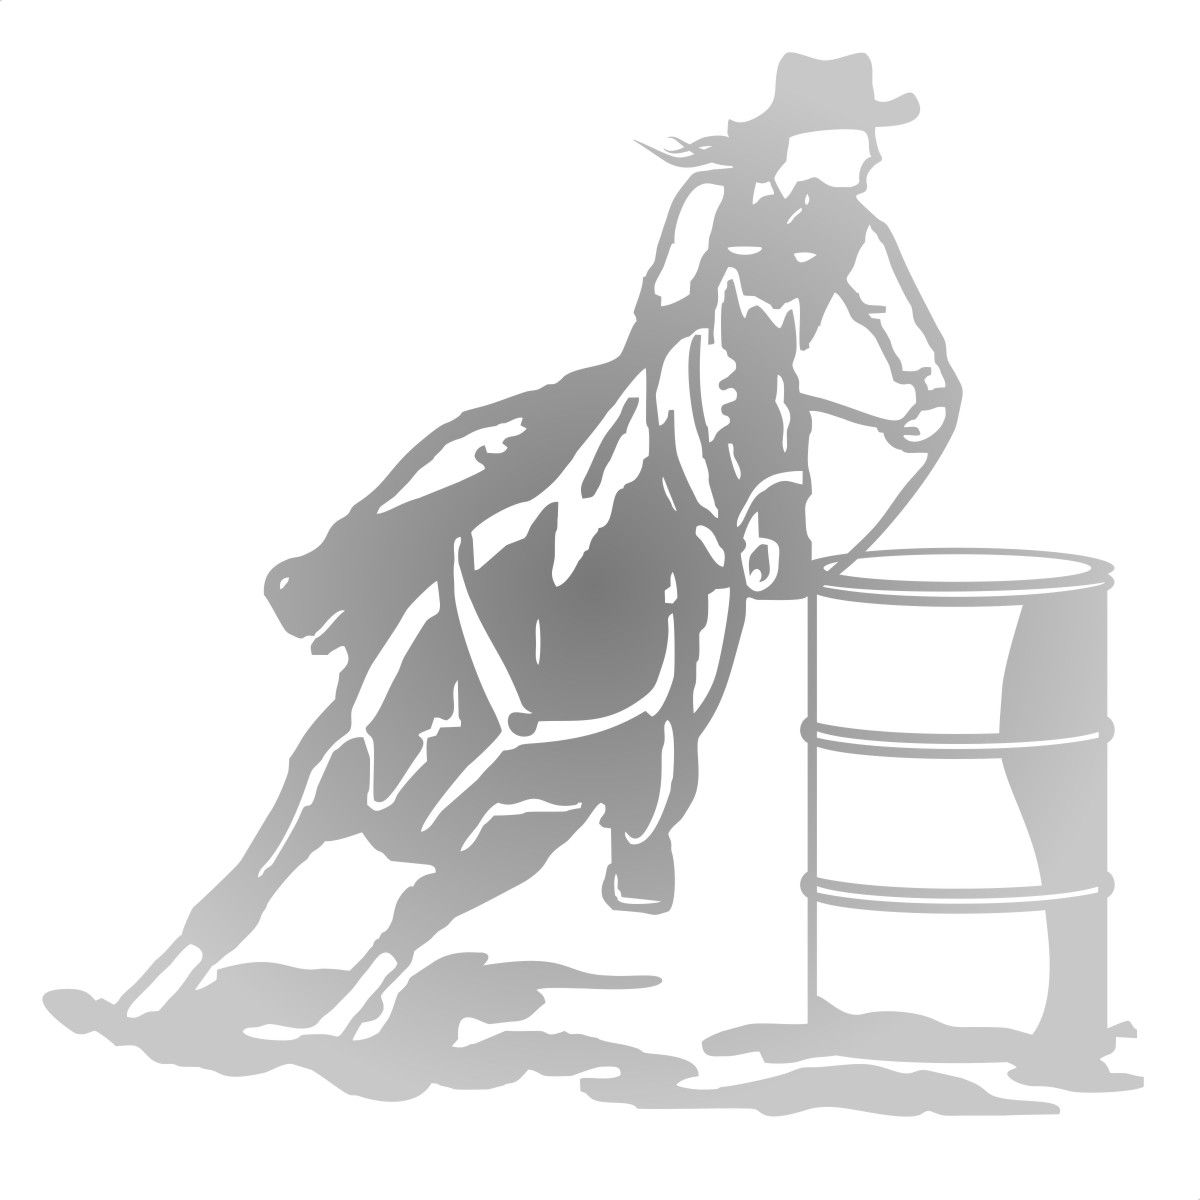 Adesivo Cavaleira - Três Tambores